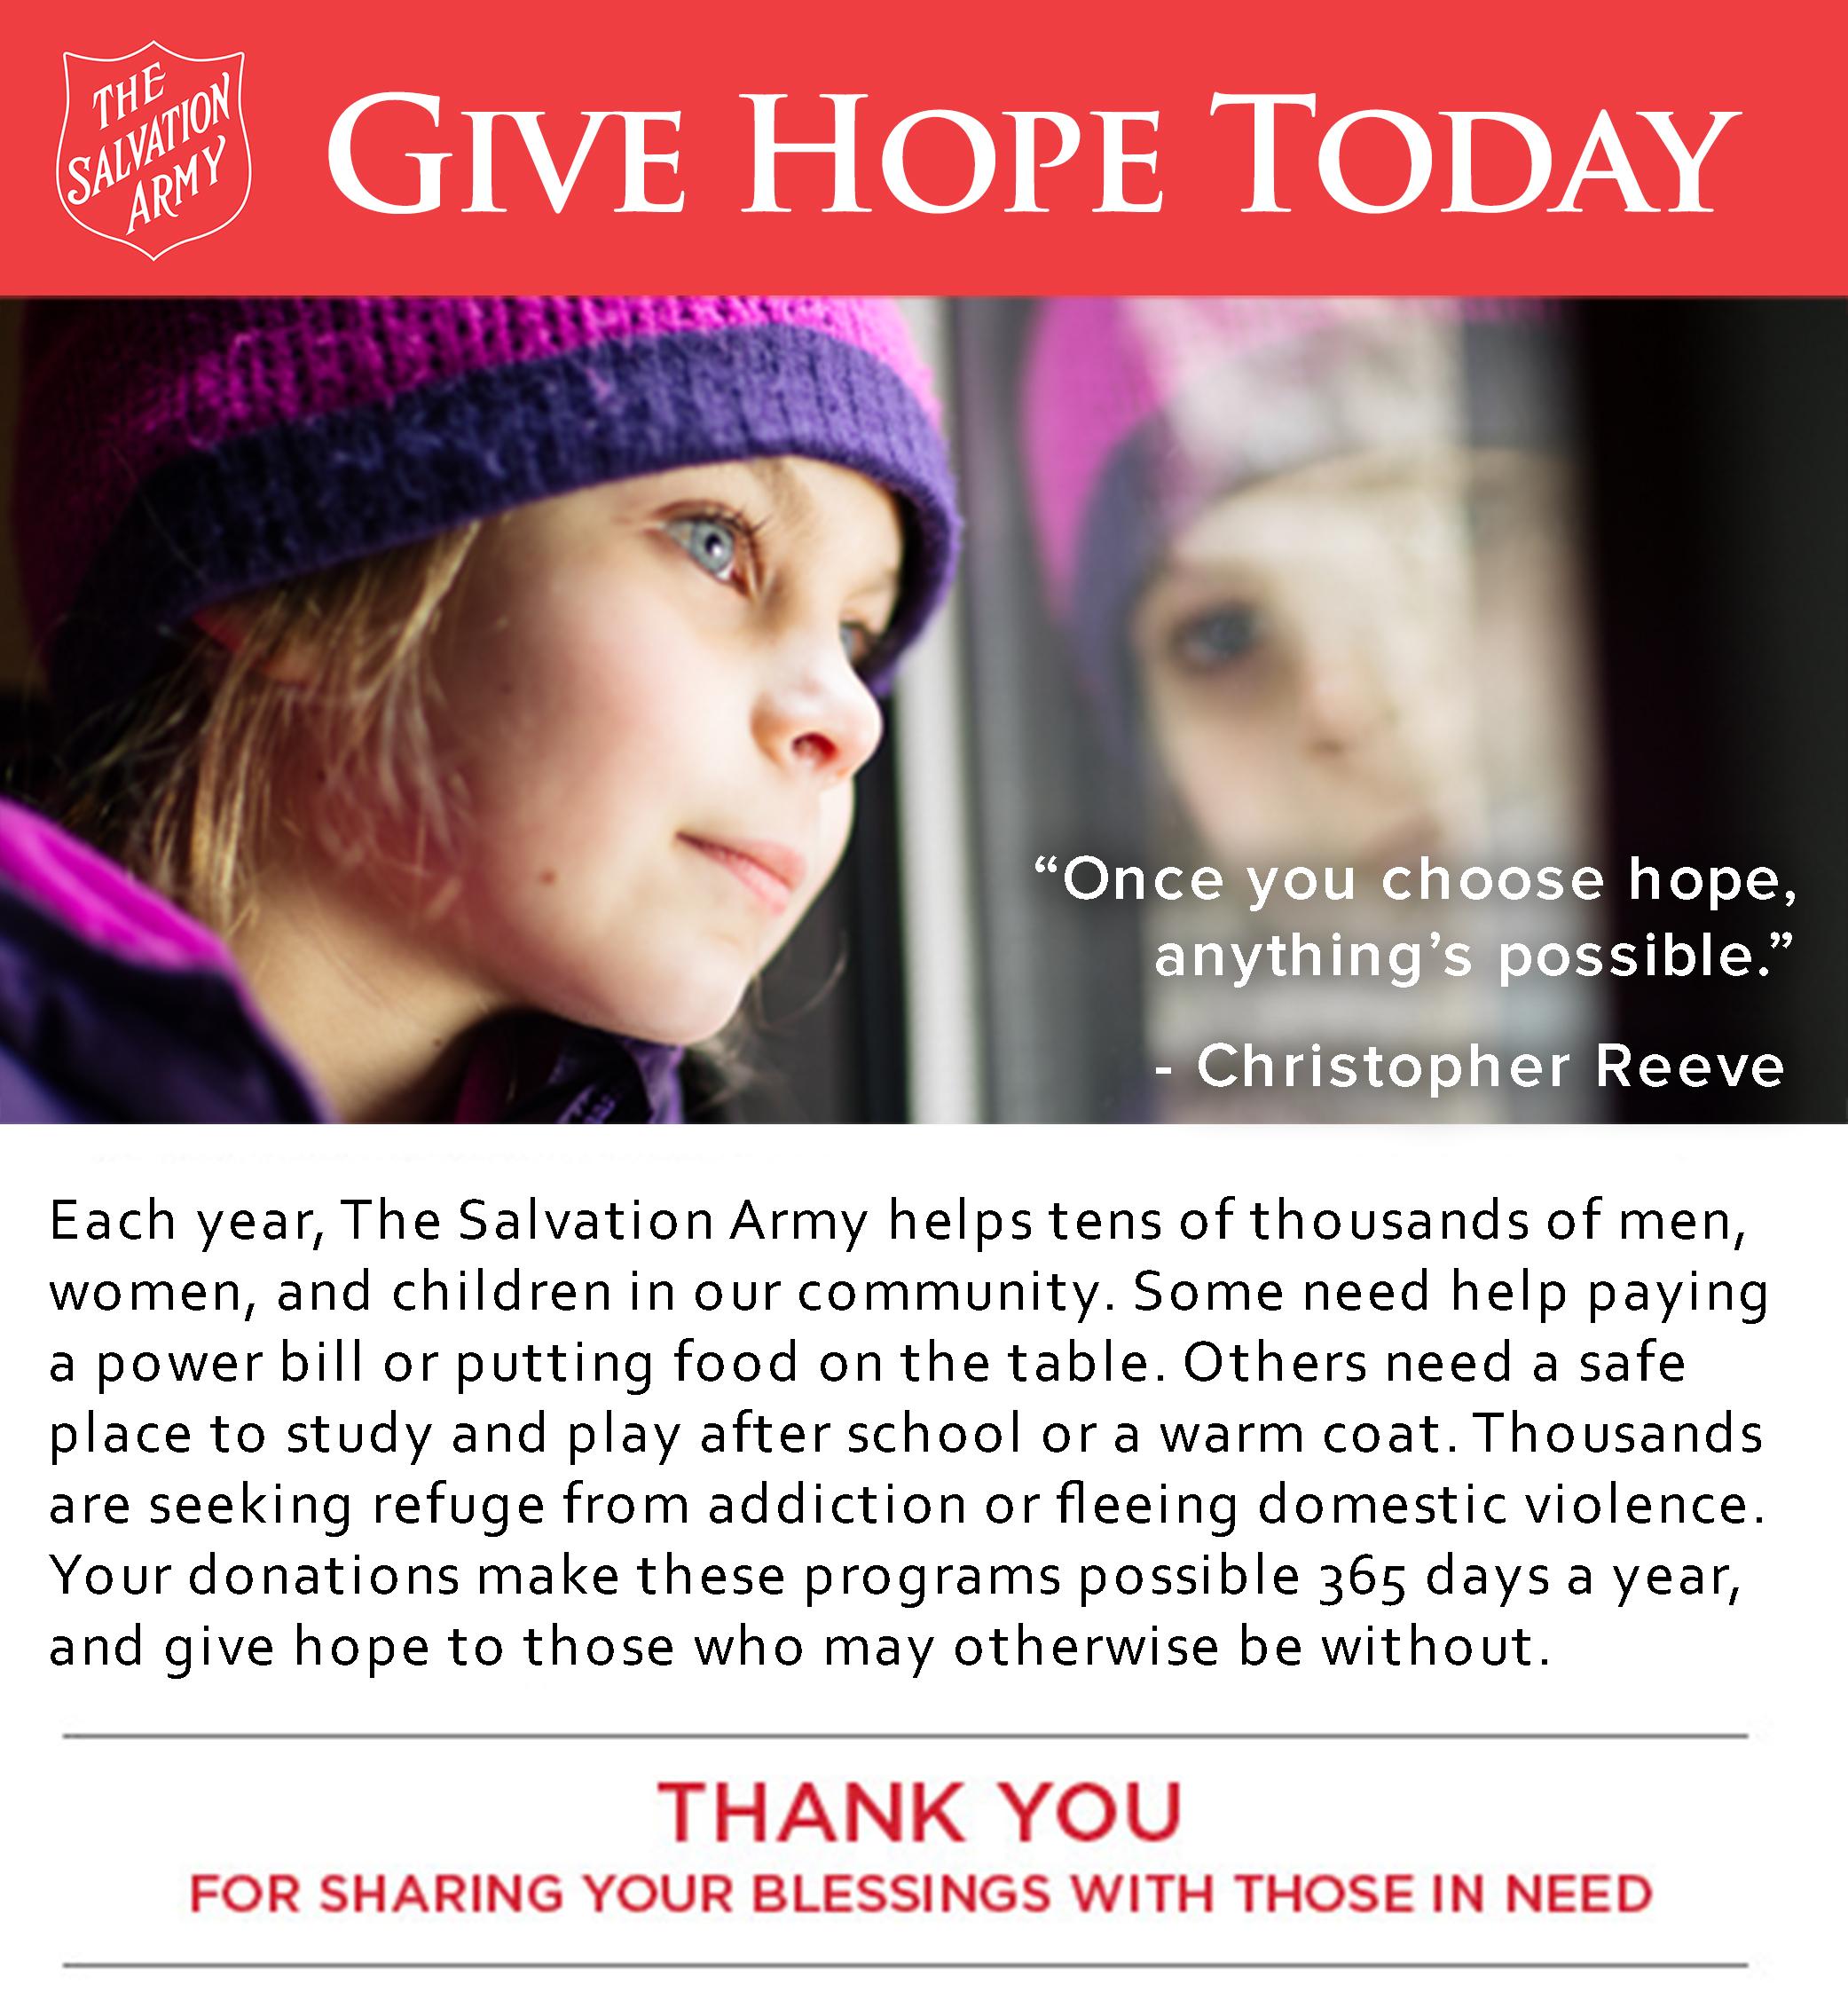 Tsa-donate-mobile-cause-donation-form3